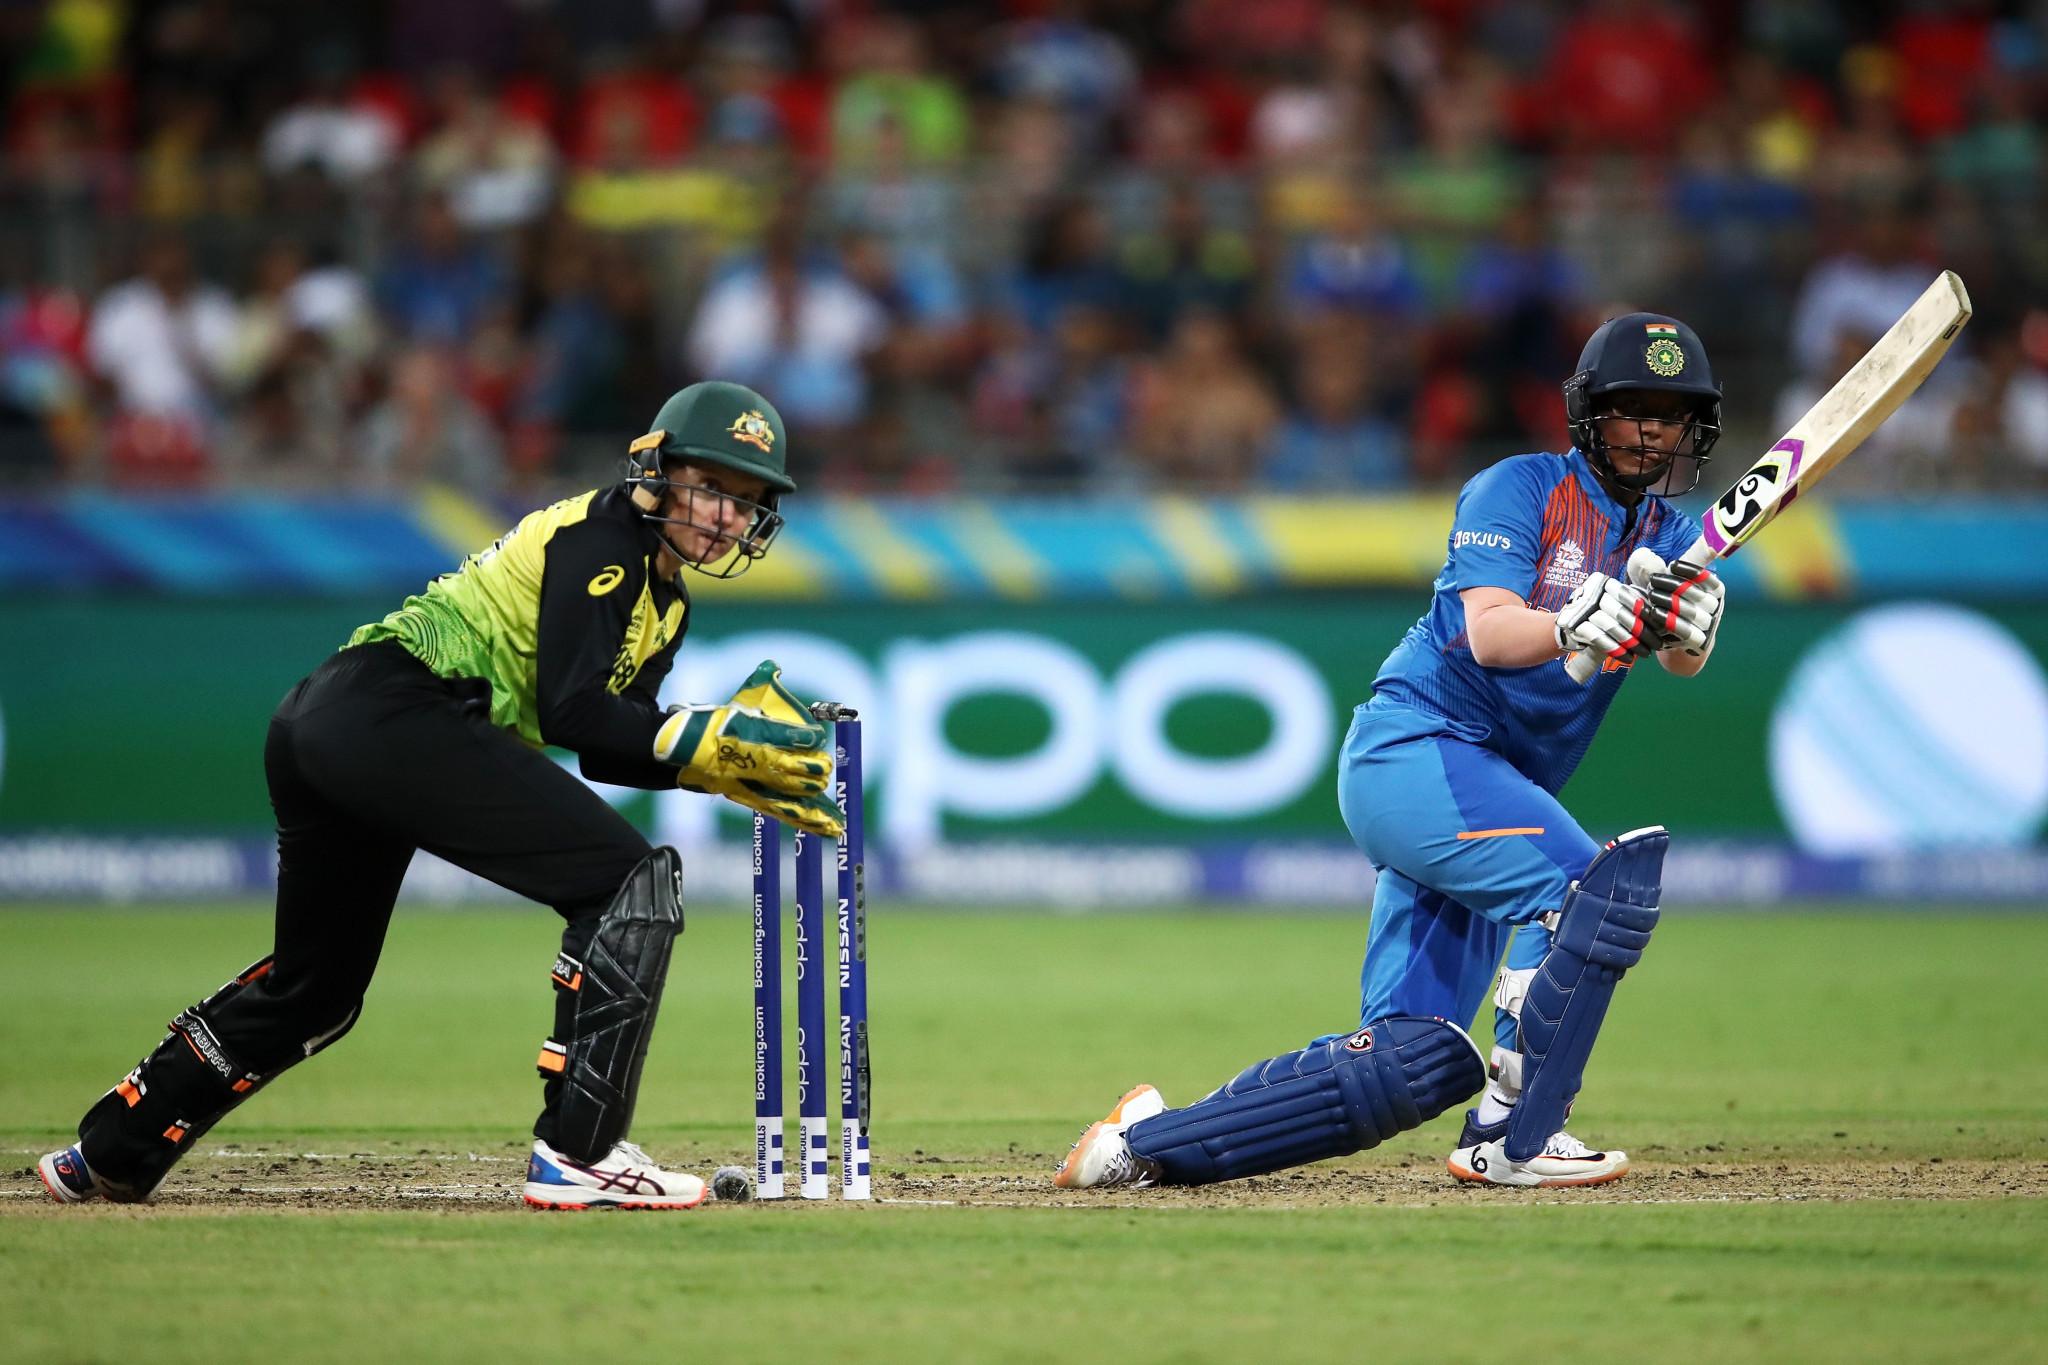 India stun defending champions Australia in ICC Women's World Twenty20 opener